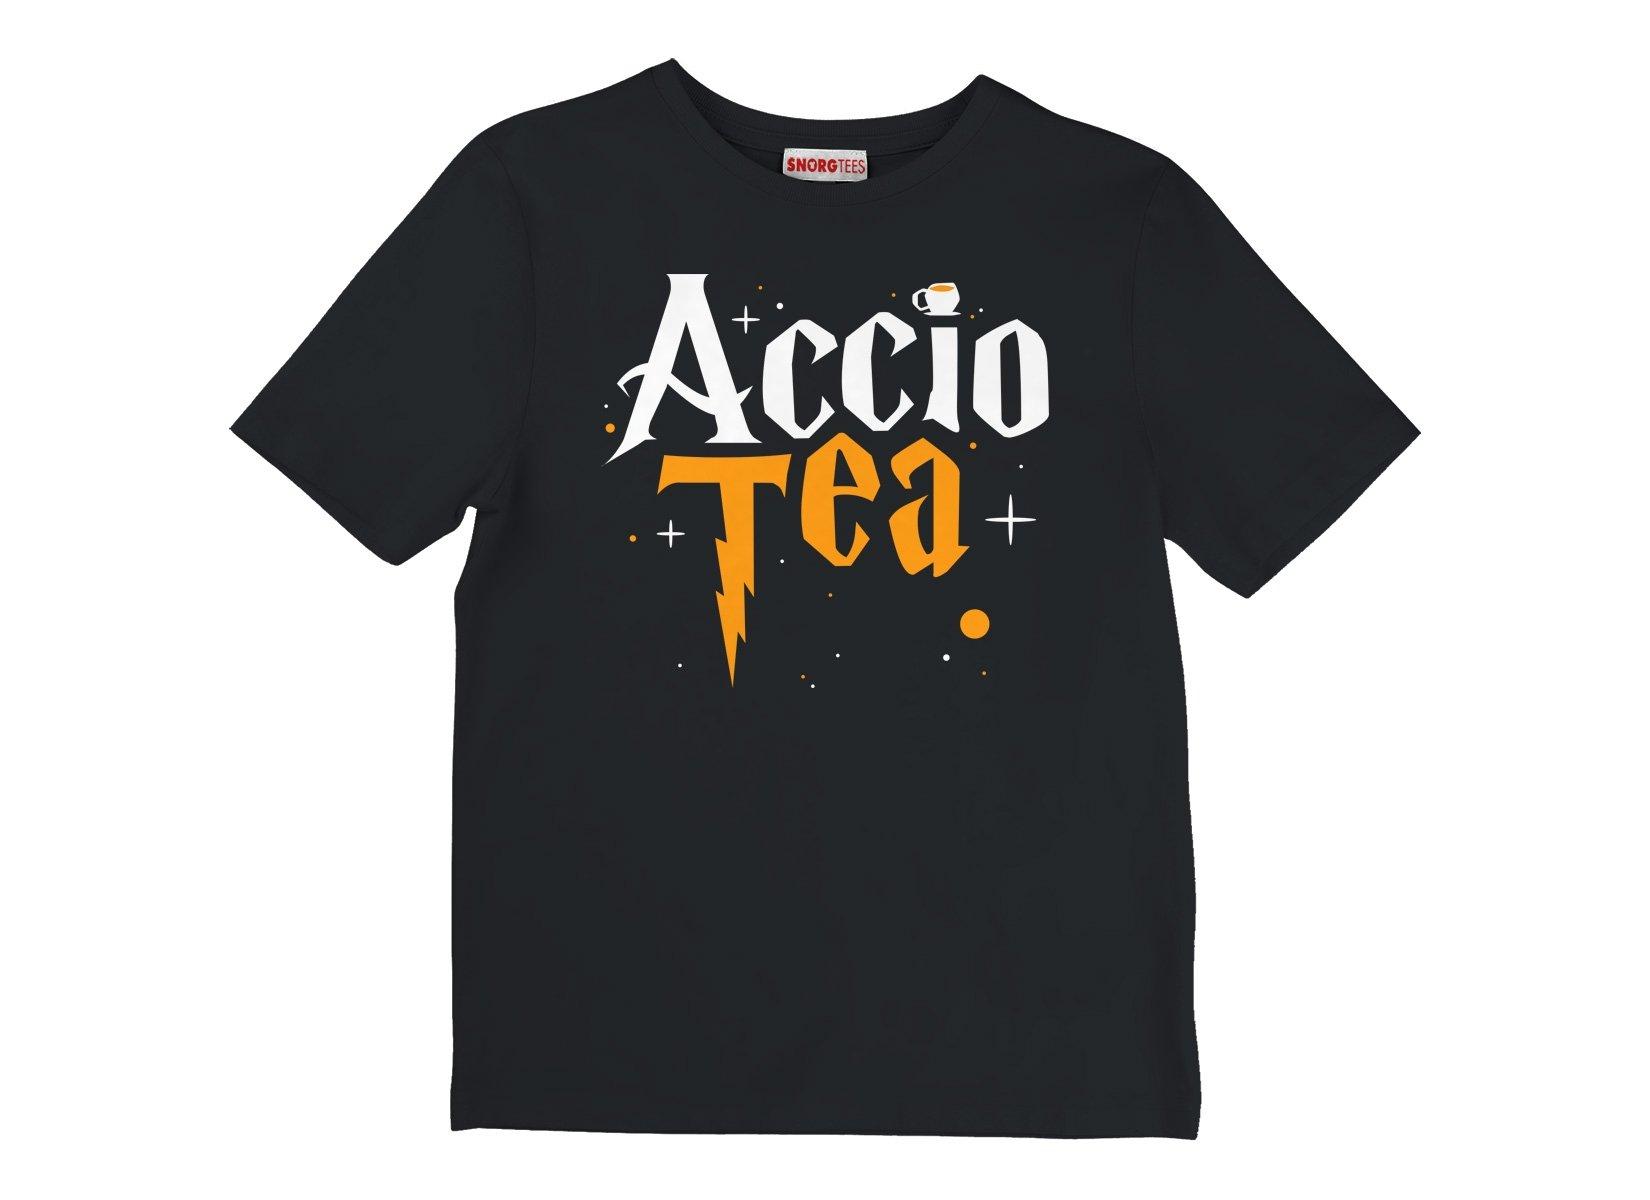 Accio Tea on Kids T-Shirt